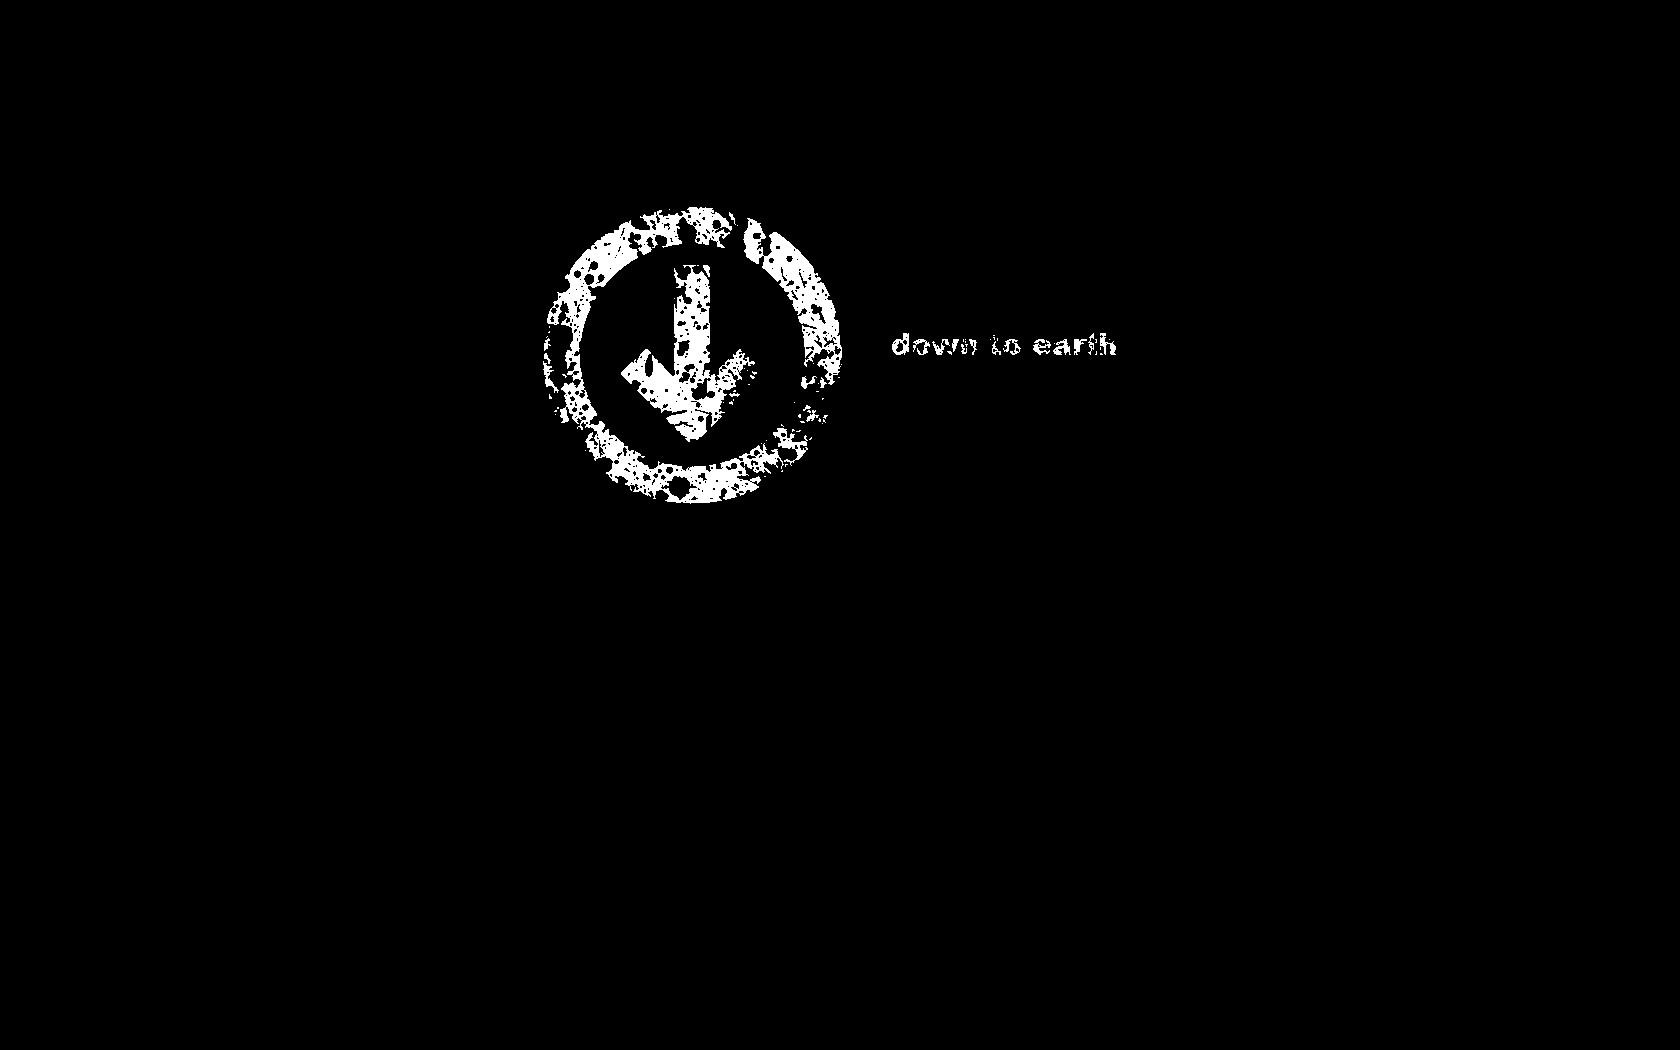 Papel De Parede Texto Logotipo Círculo Marca Frase Trevas